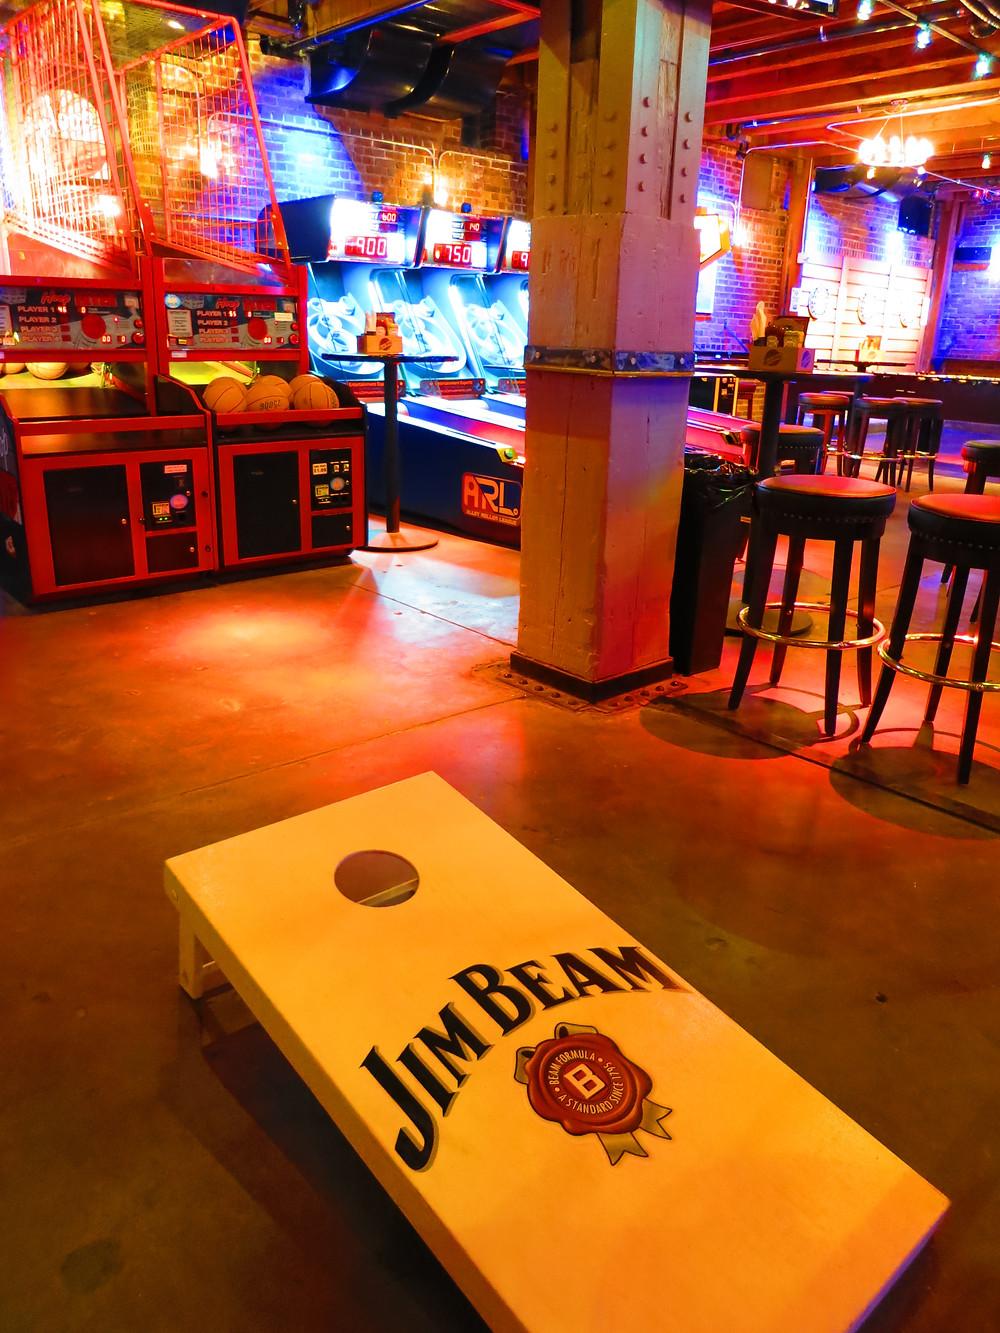 Arcade Games in Downtown Denver - Blake Street Tavern